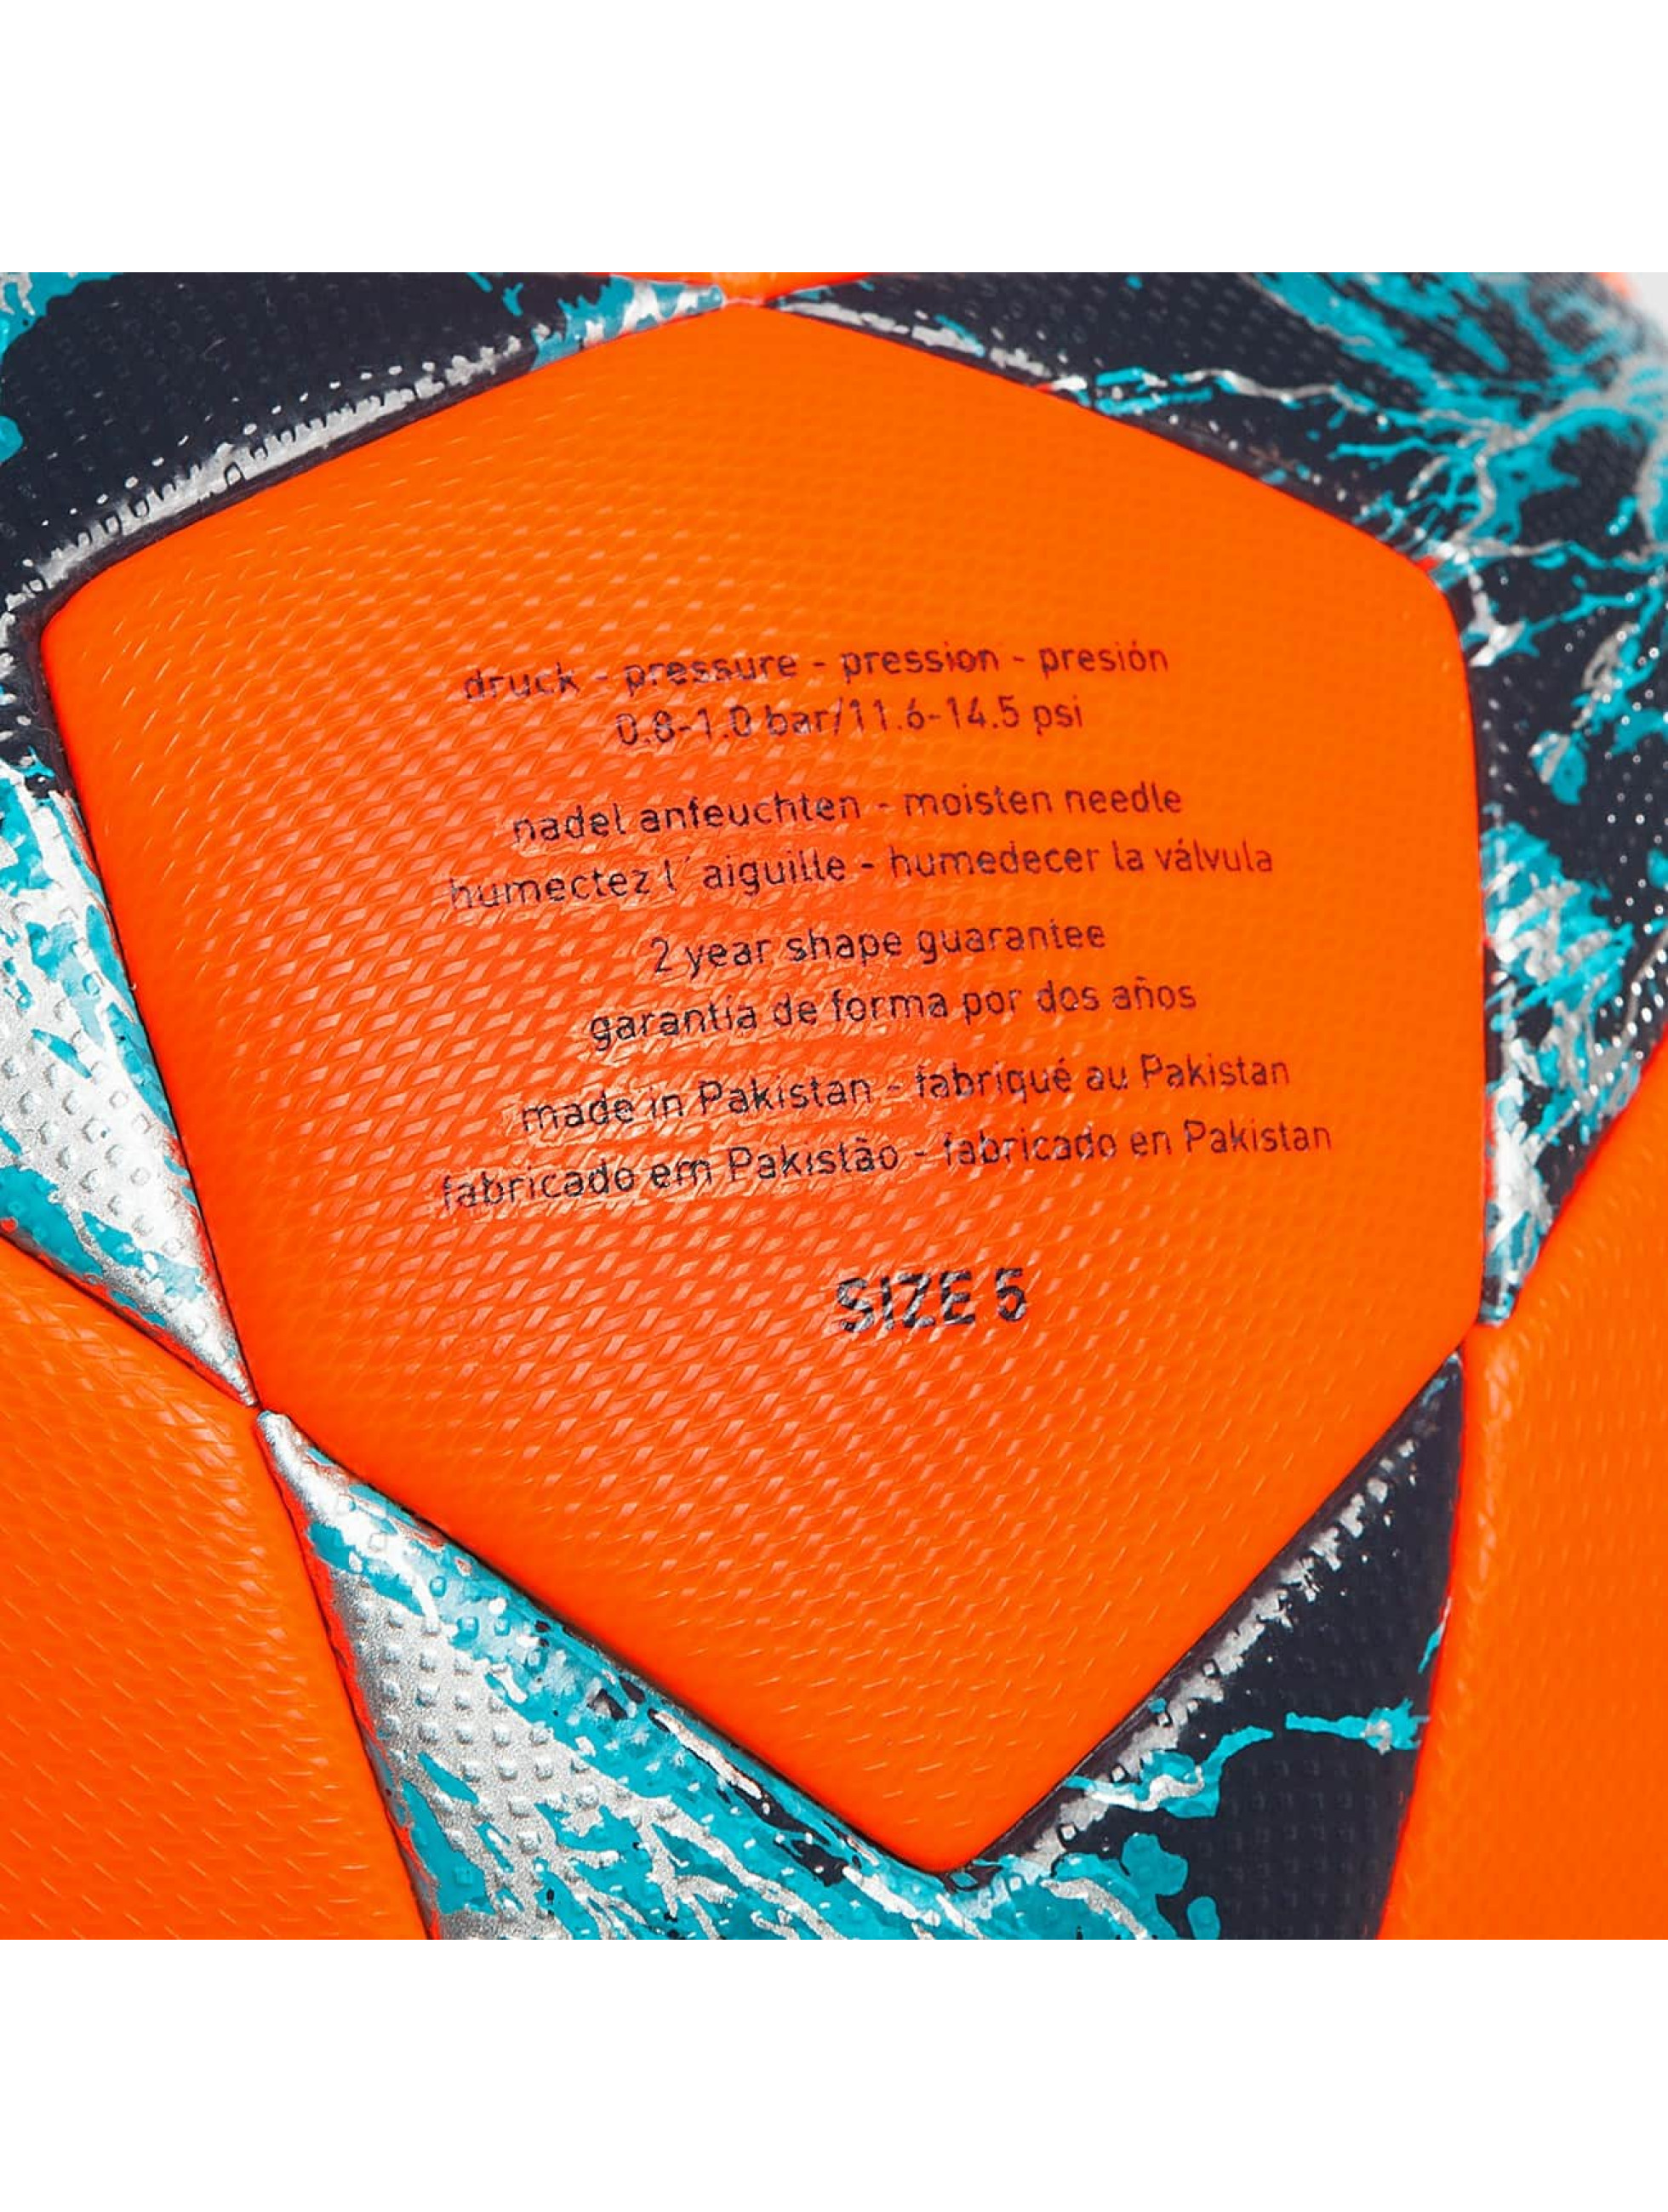 adidas originals Piłki Final 17 Offical Match pomaranczowy